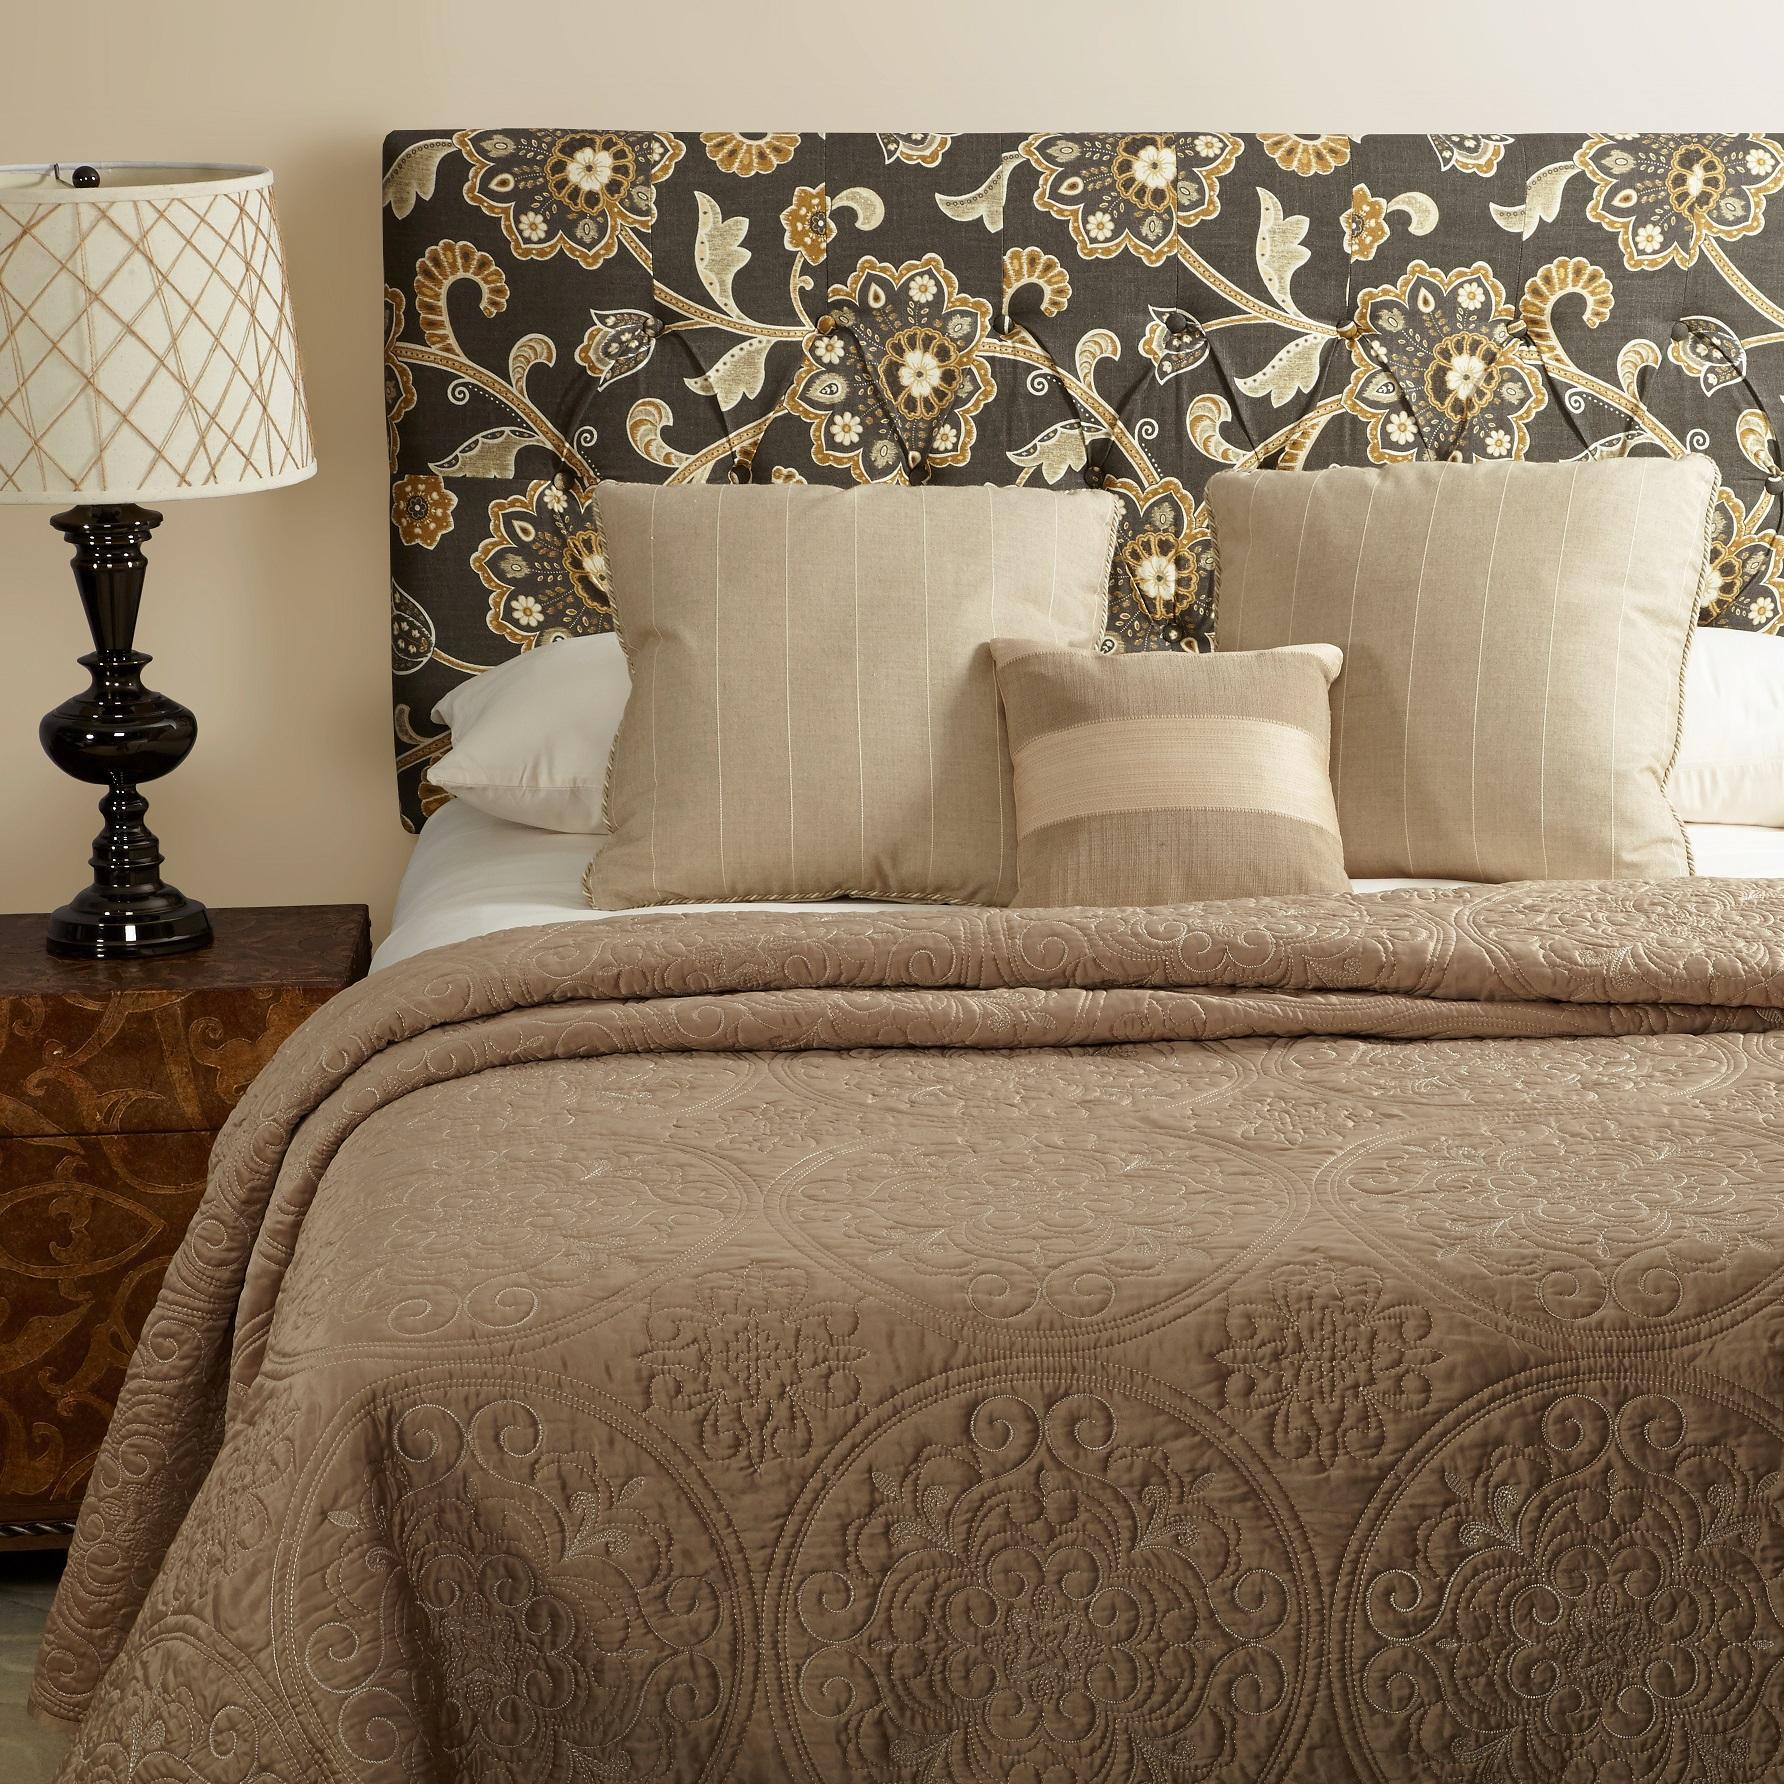 humble haute harlow floral diamond tufted. Black Bedroom Furniture Sets. Home Design Ideas